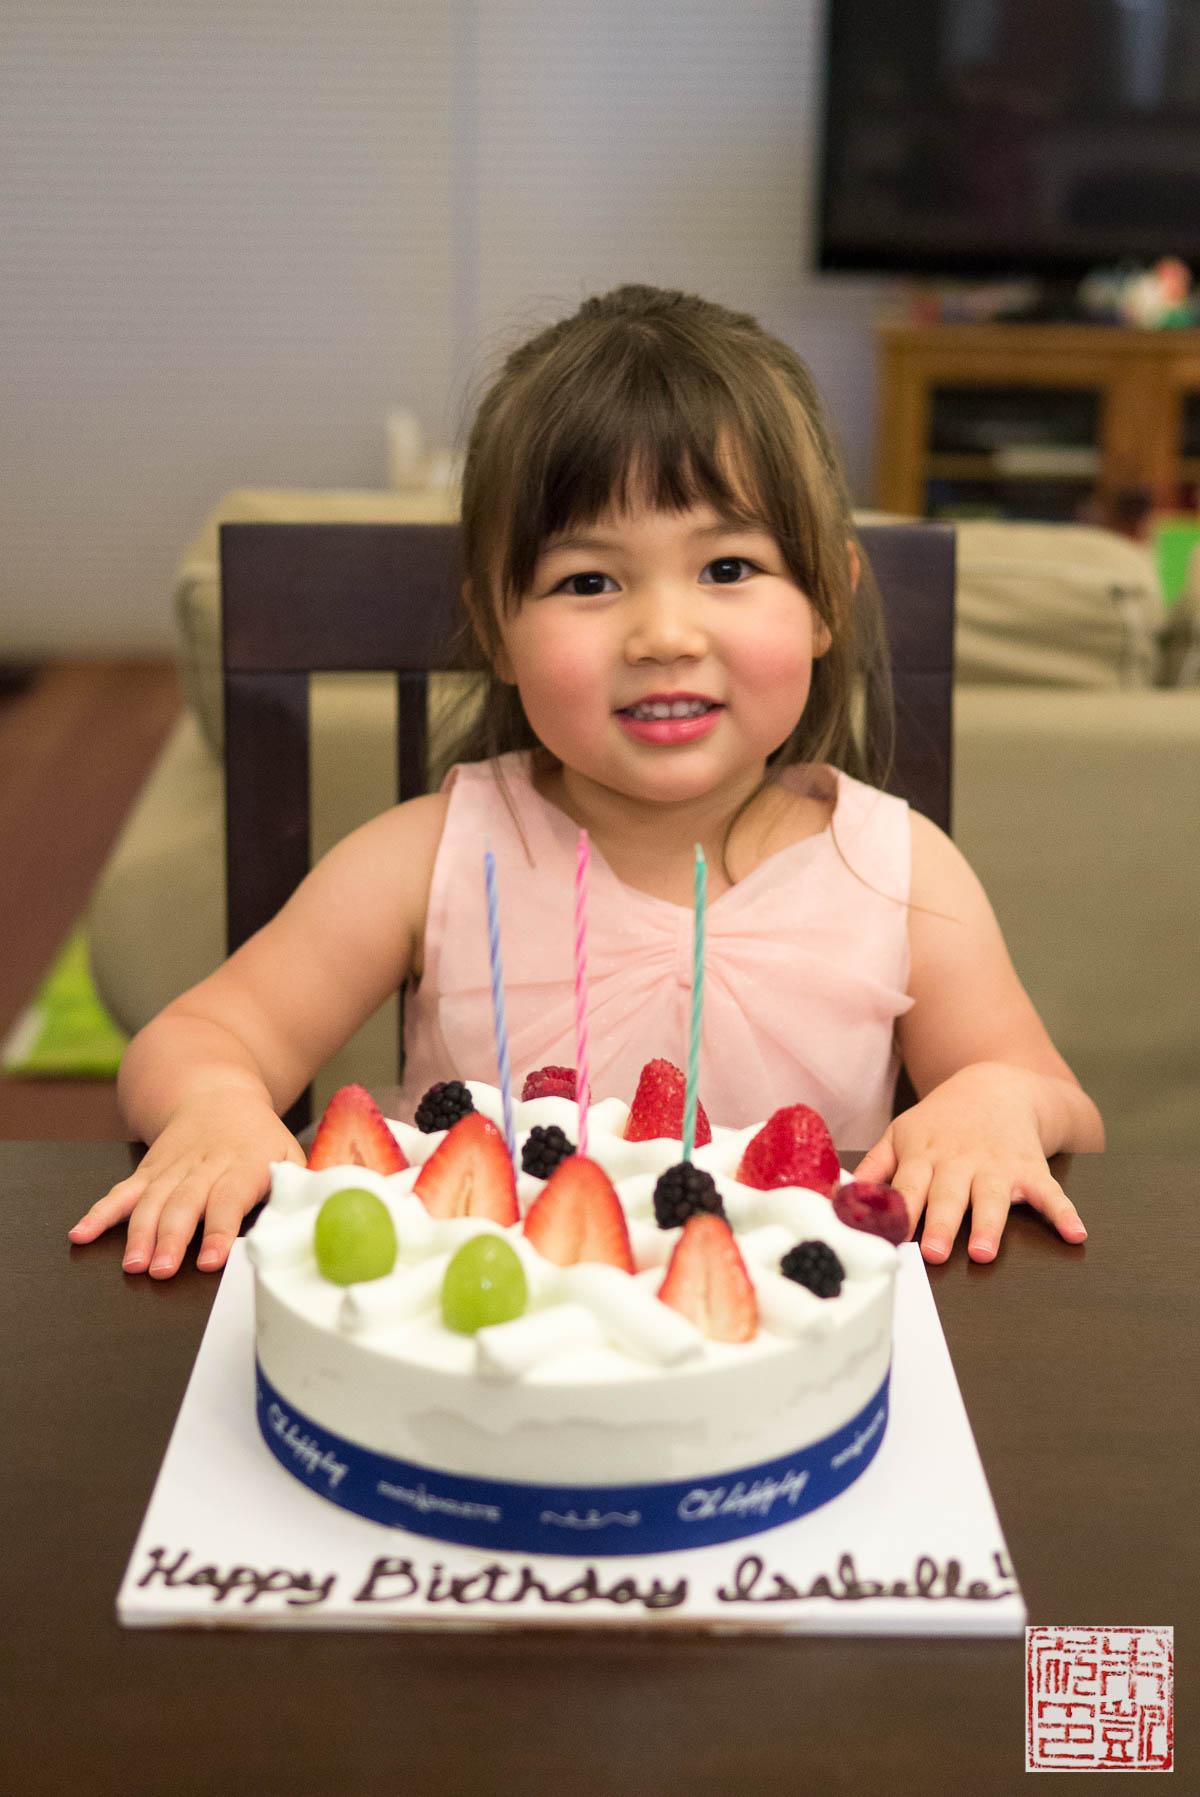 Best Birthday Cake Bakery San Francisco